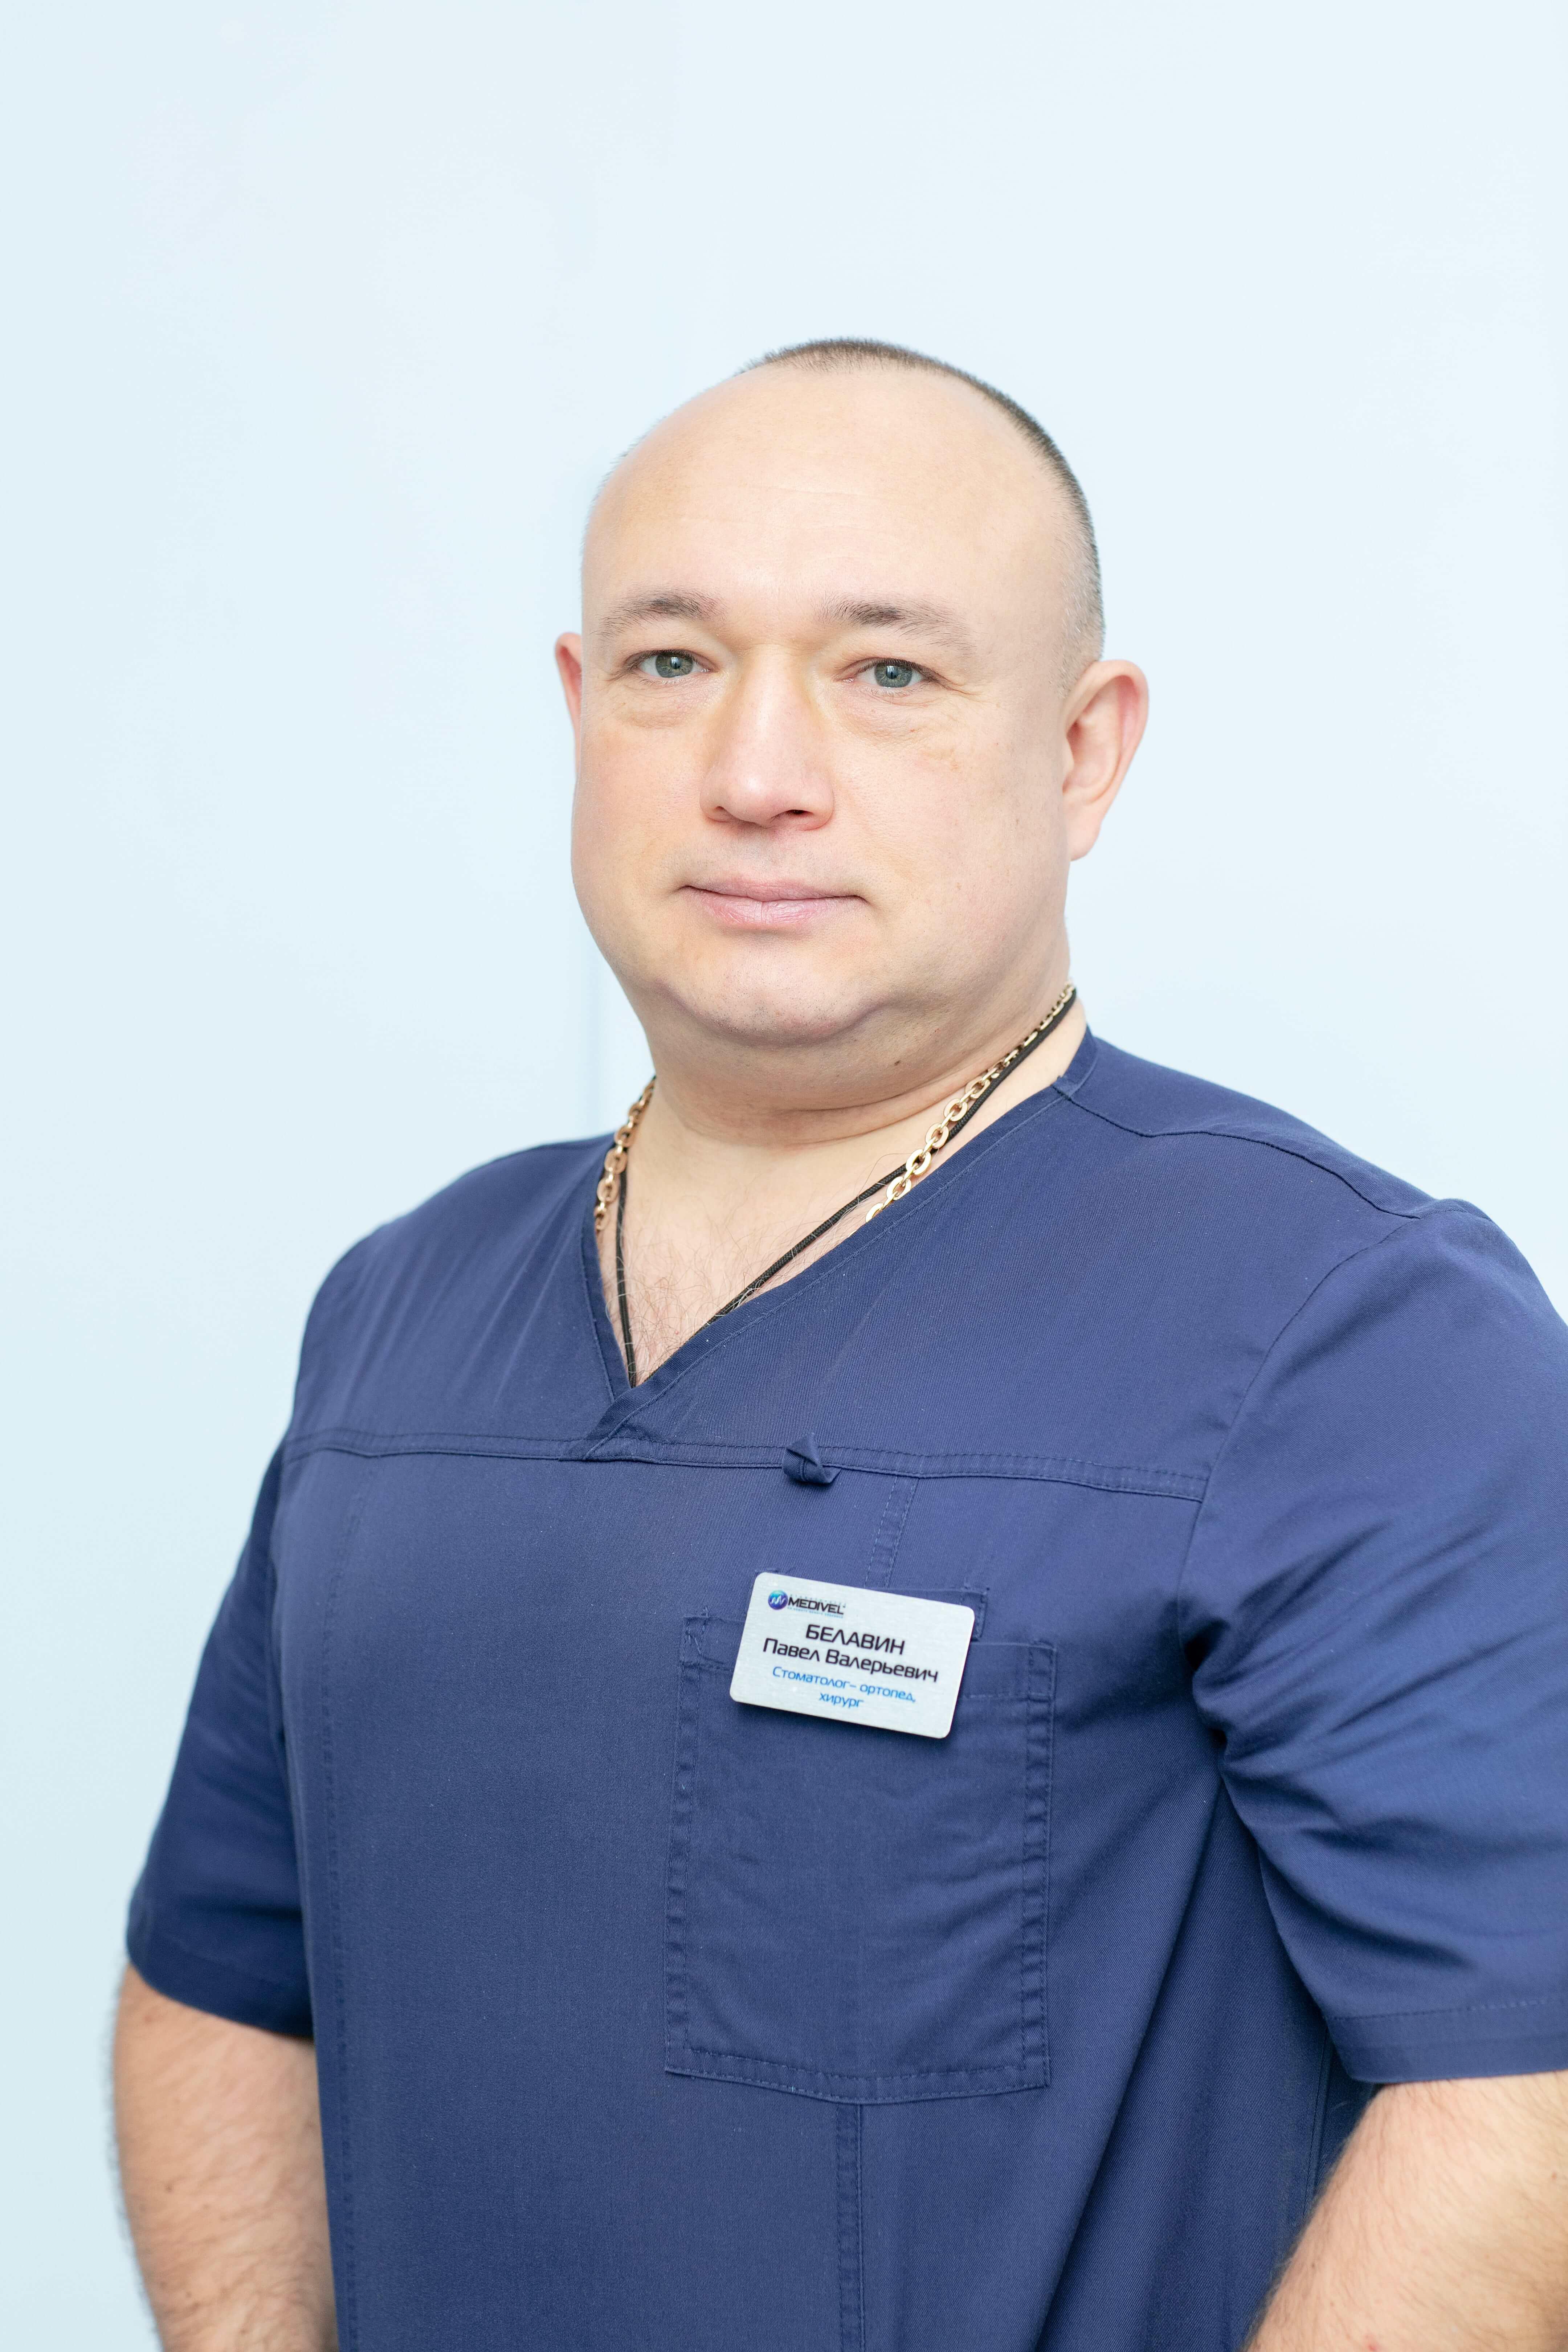 Белавин Павел Валерьевич